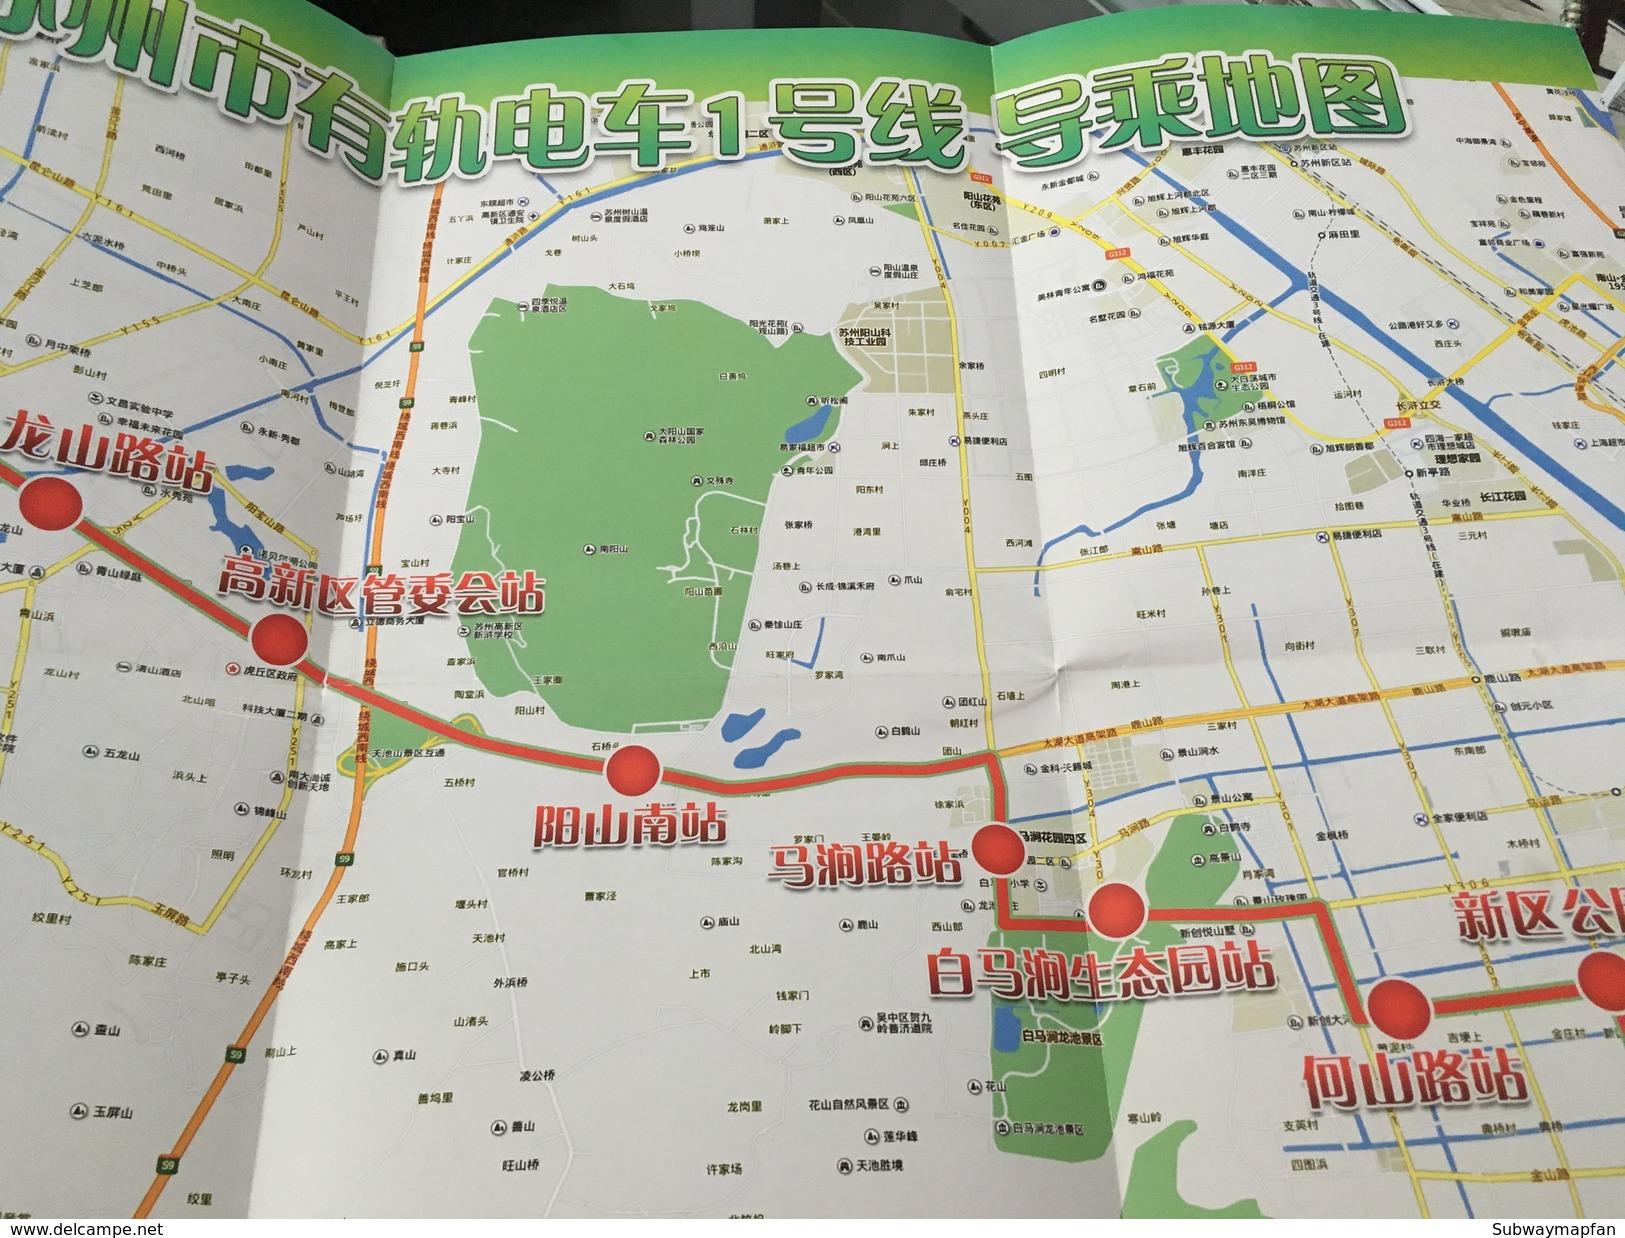 Transit Map Shenzen - Subway Bus Tram - World